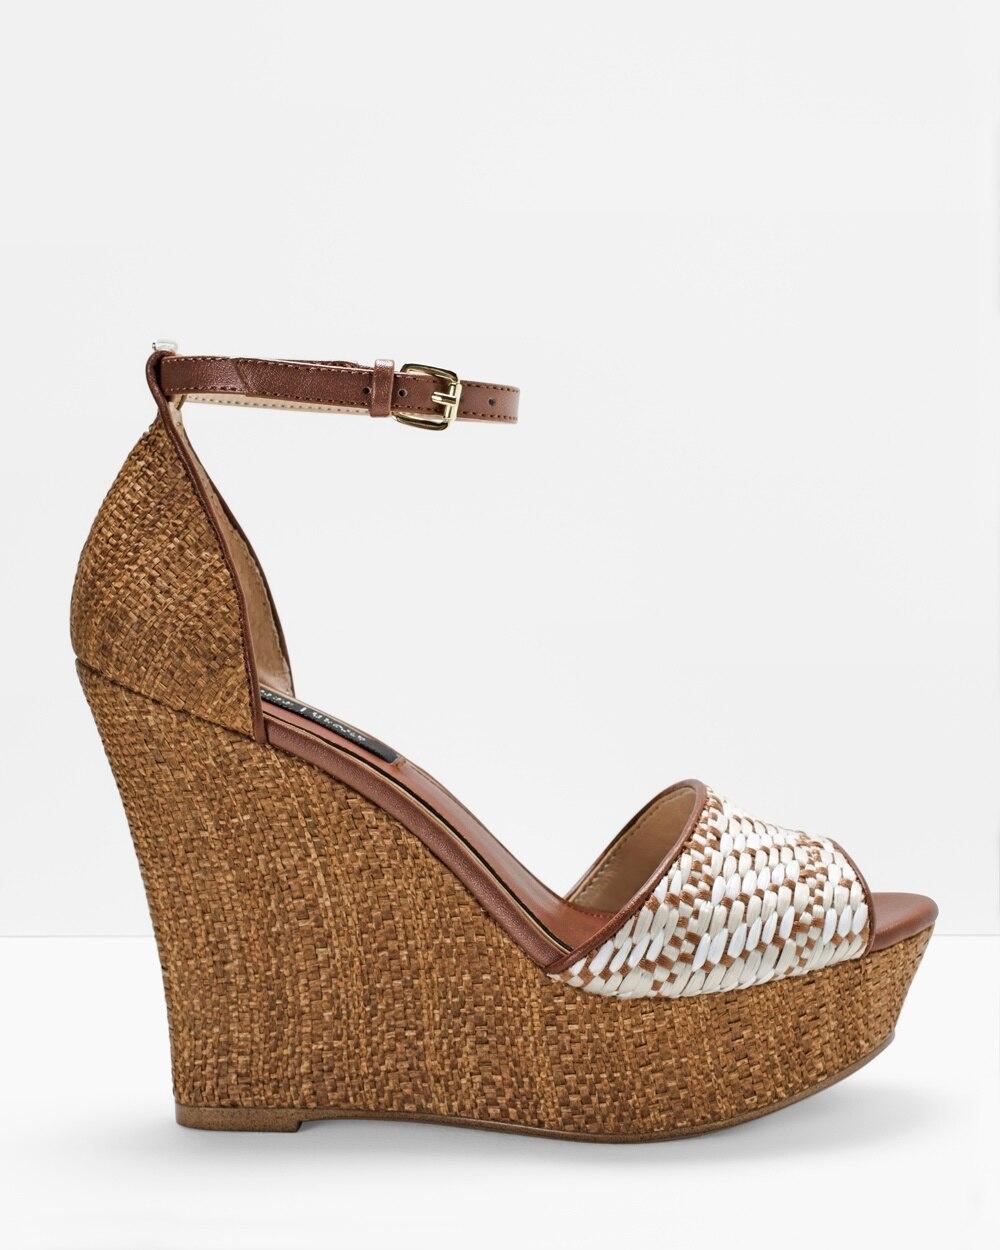 809054d2224 Raffia Wedge Sandals - White House Black Market